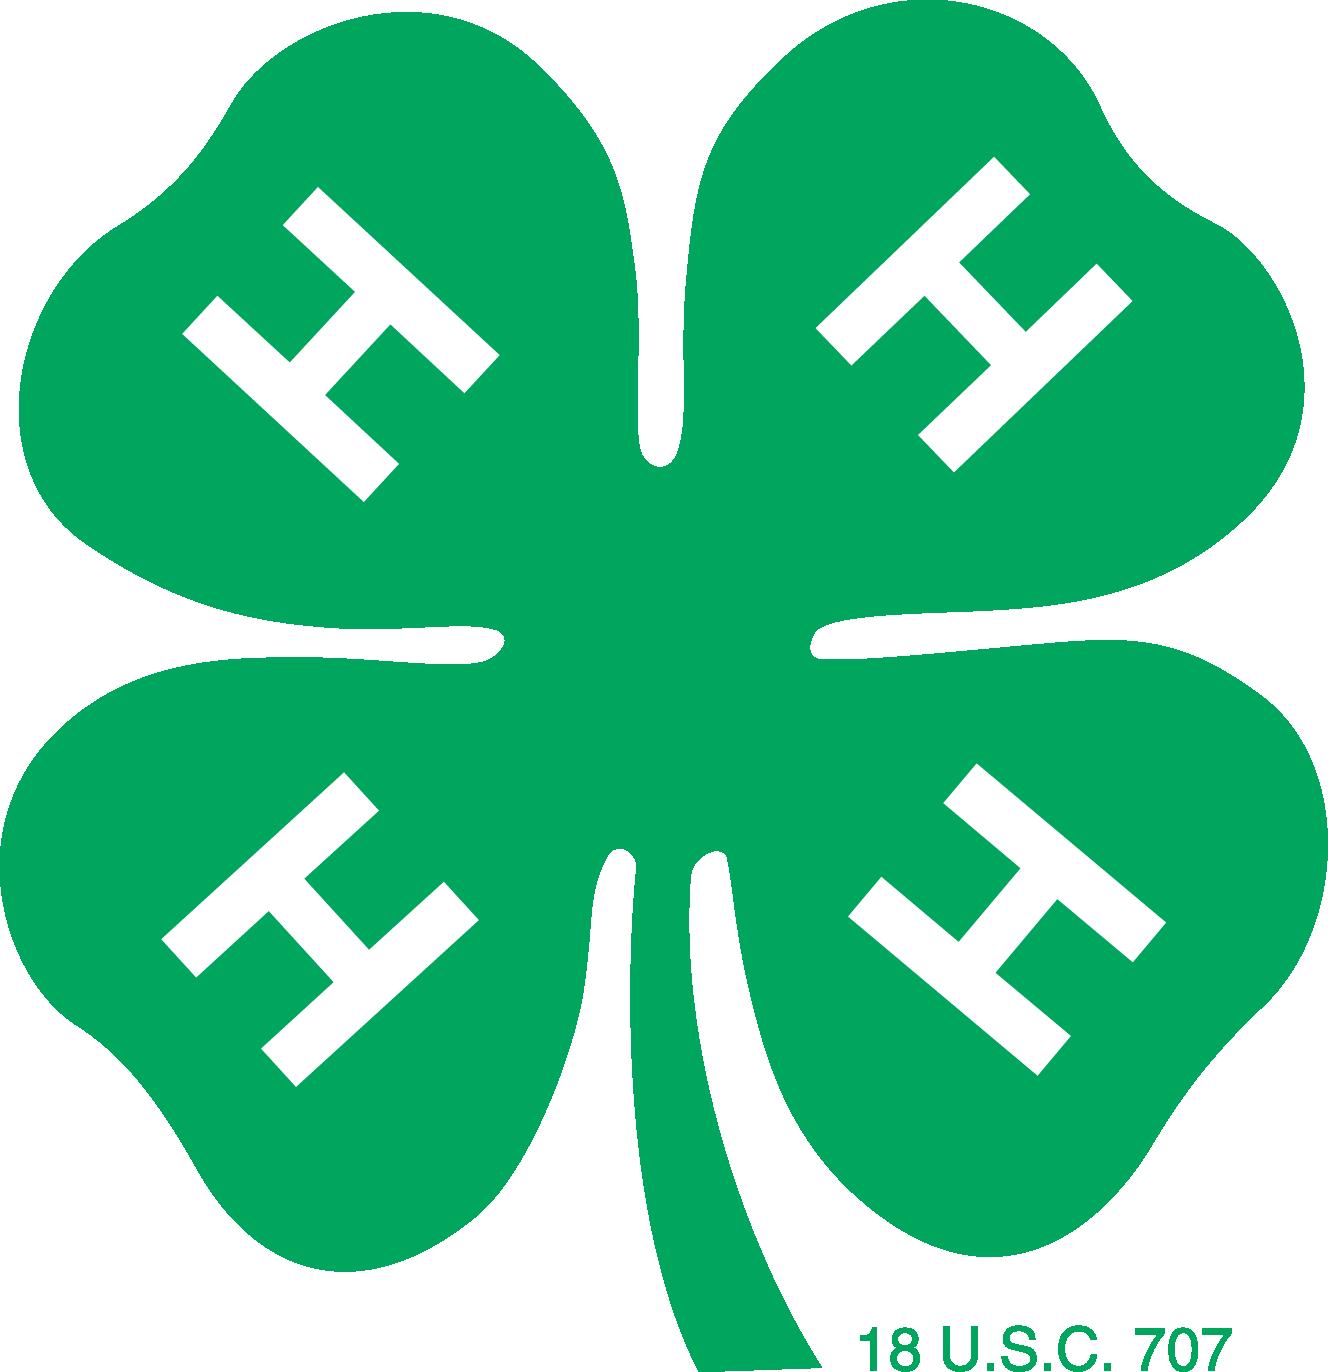 4 h logos spokane county washington state university